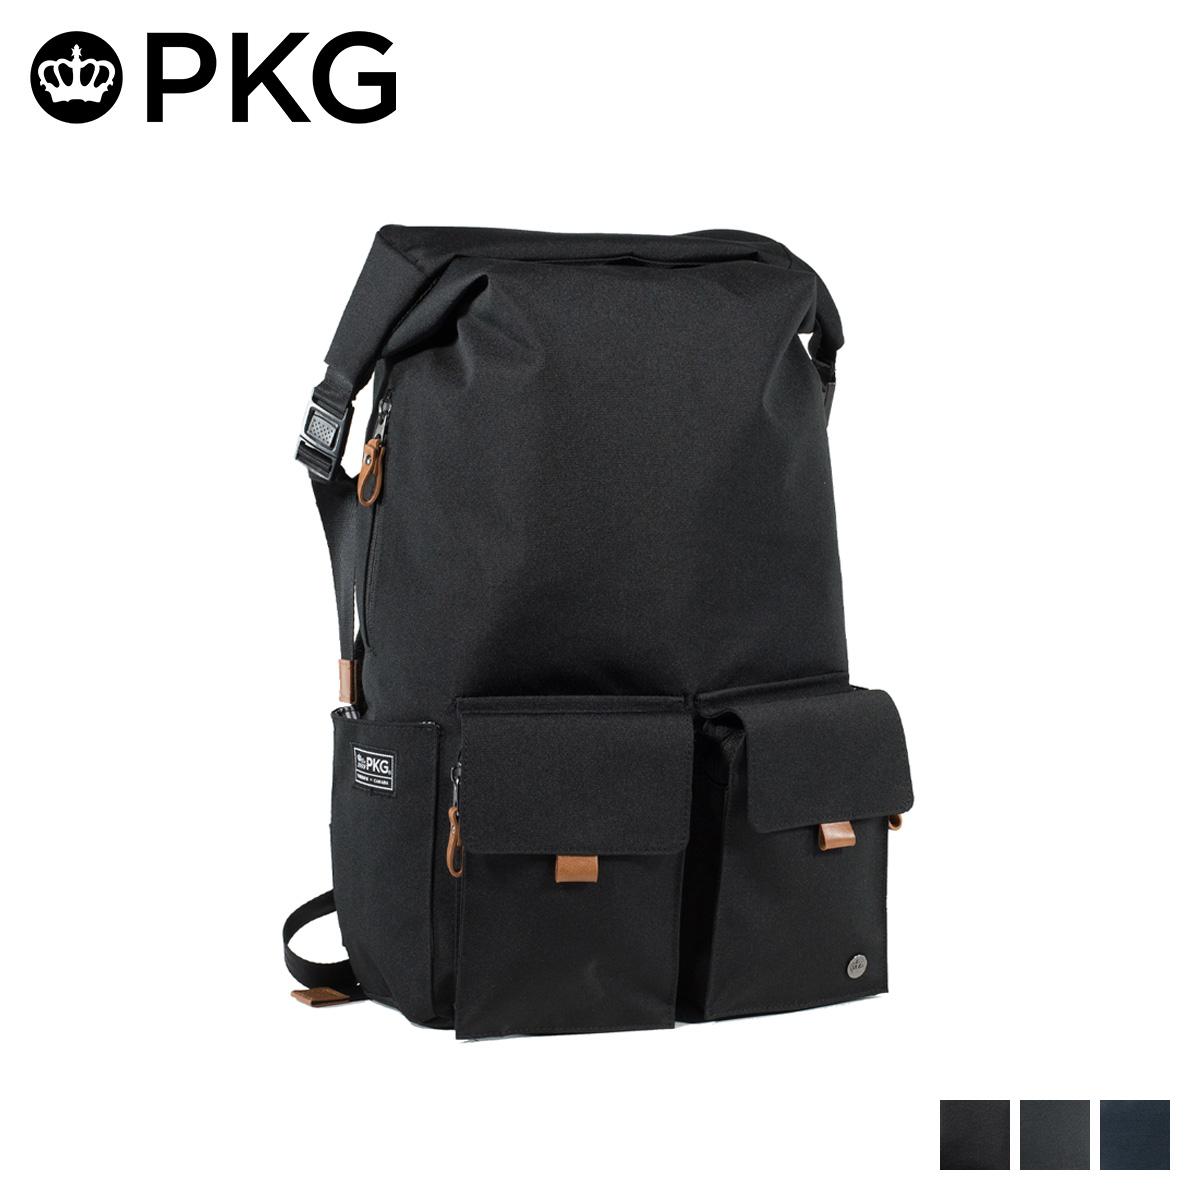 PKG CONCORD ピーケージー バッグ リュック バックパック メンズ レディース 22L ブラック グレー チャコールグレー 黒 LB01P2